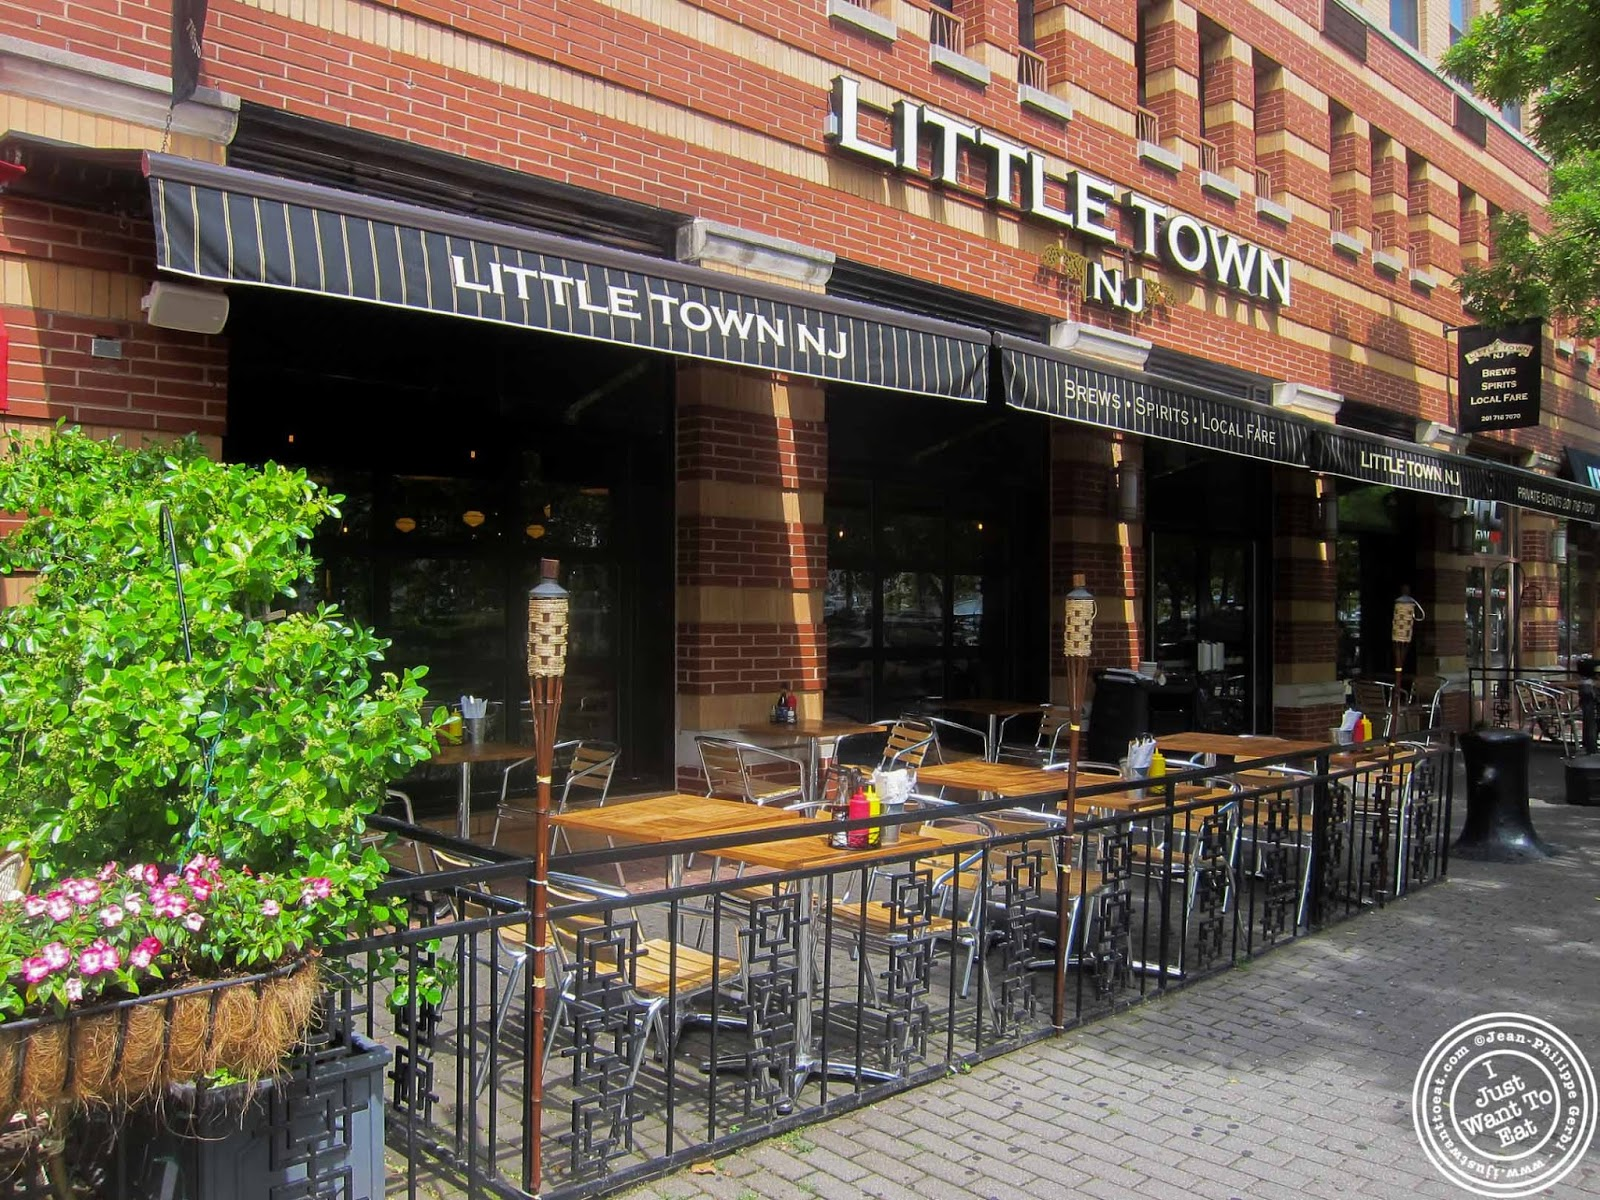 Little Town Nj Restaurant Menu